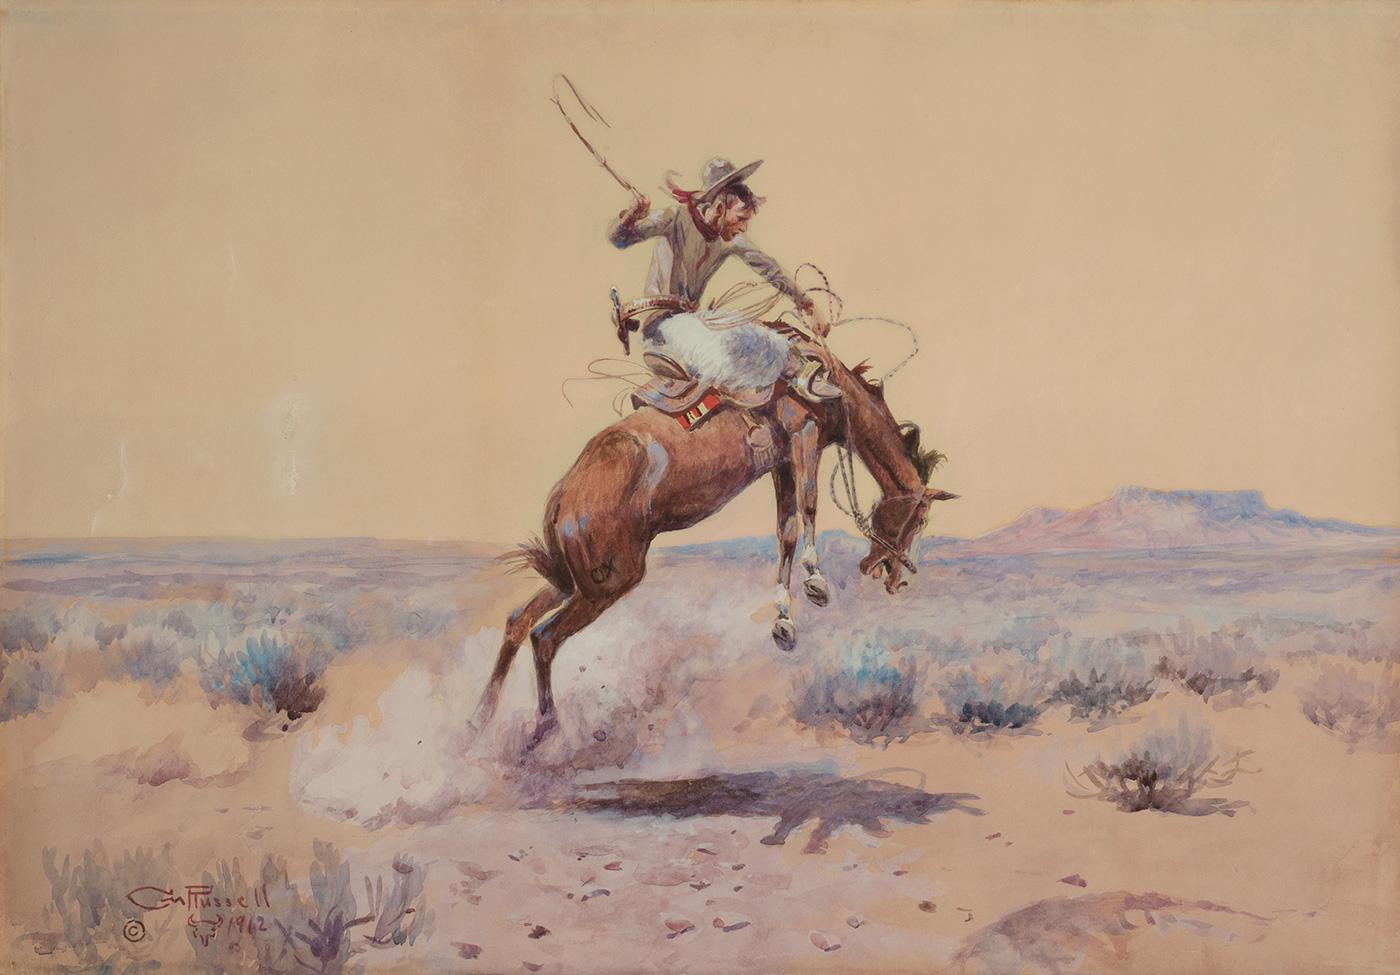 A cowboy rides a bucking horse in an open landscape.